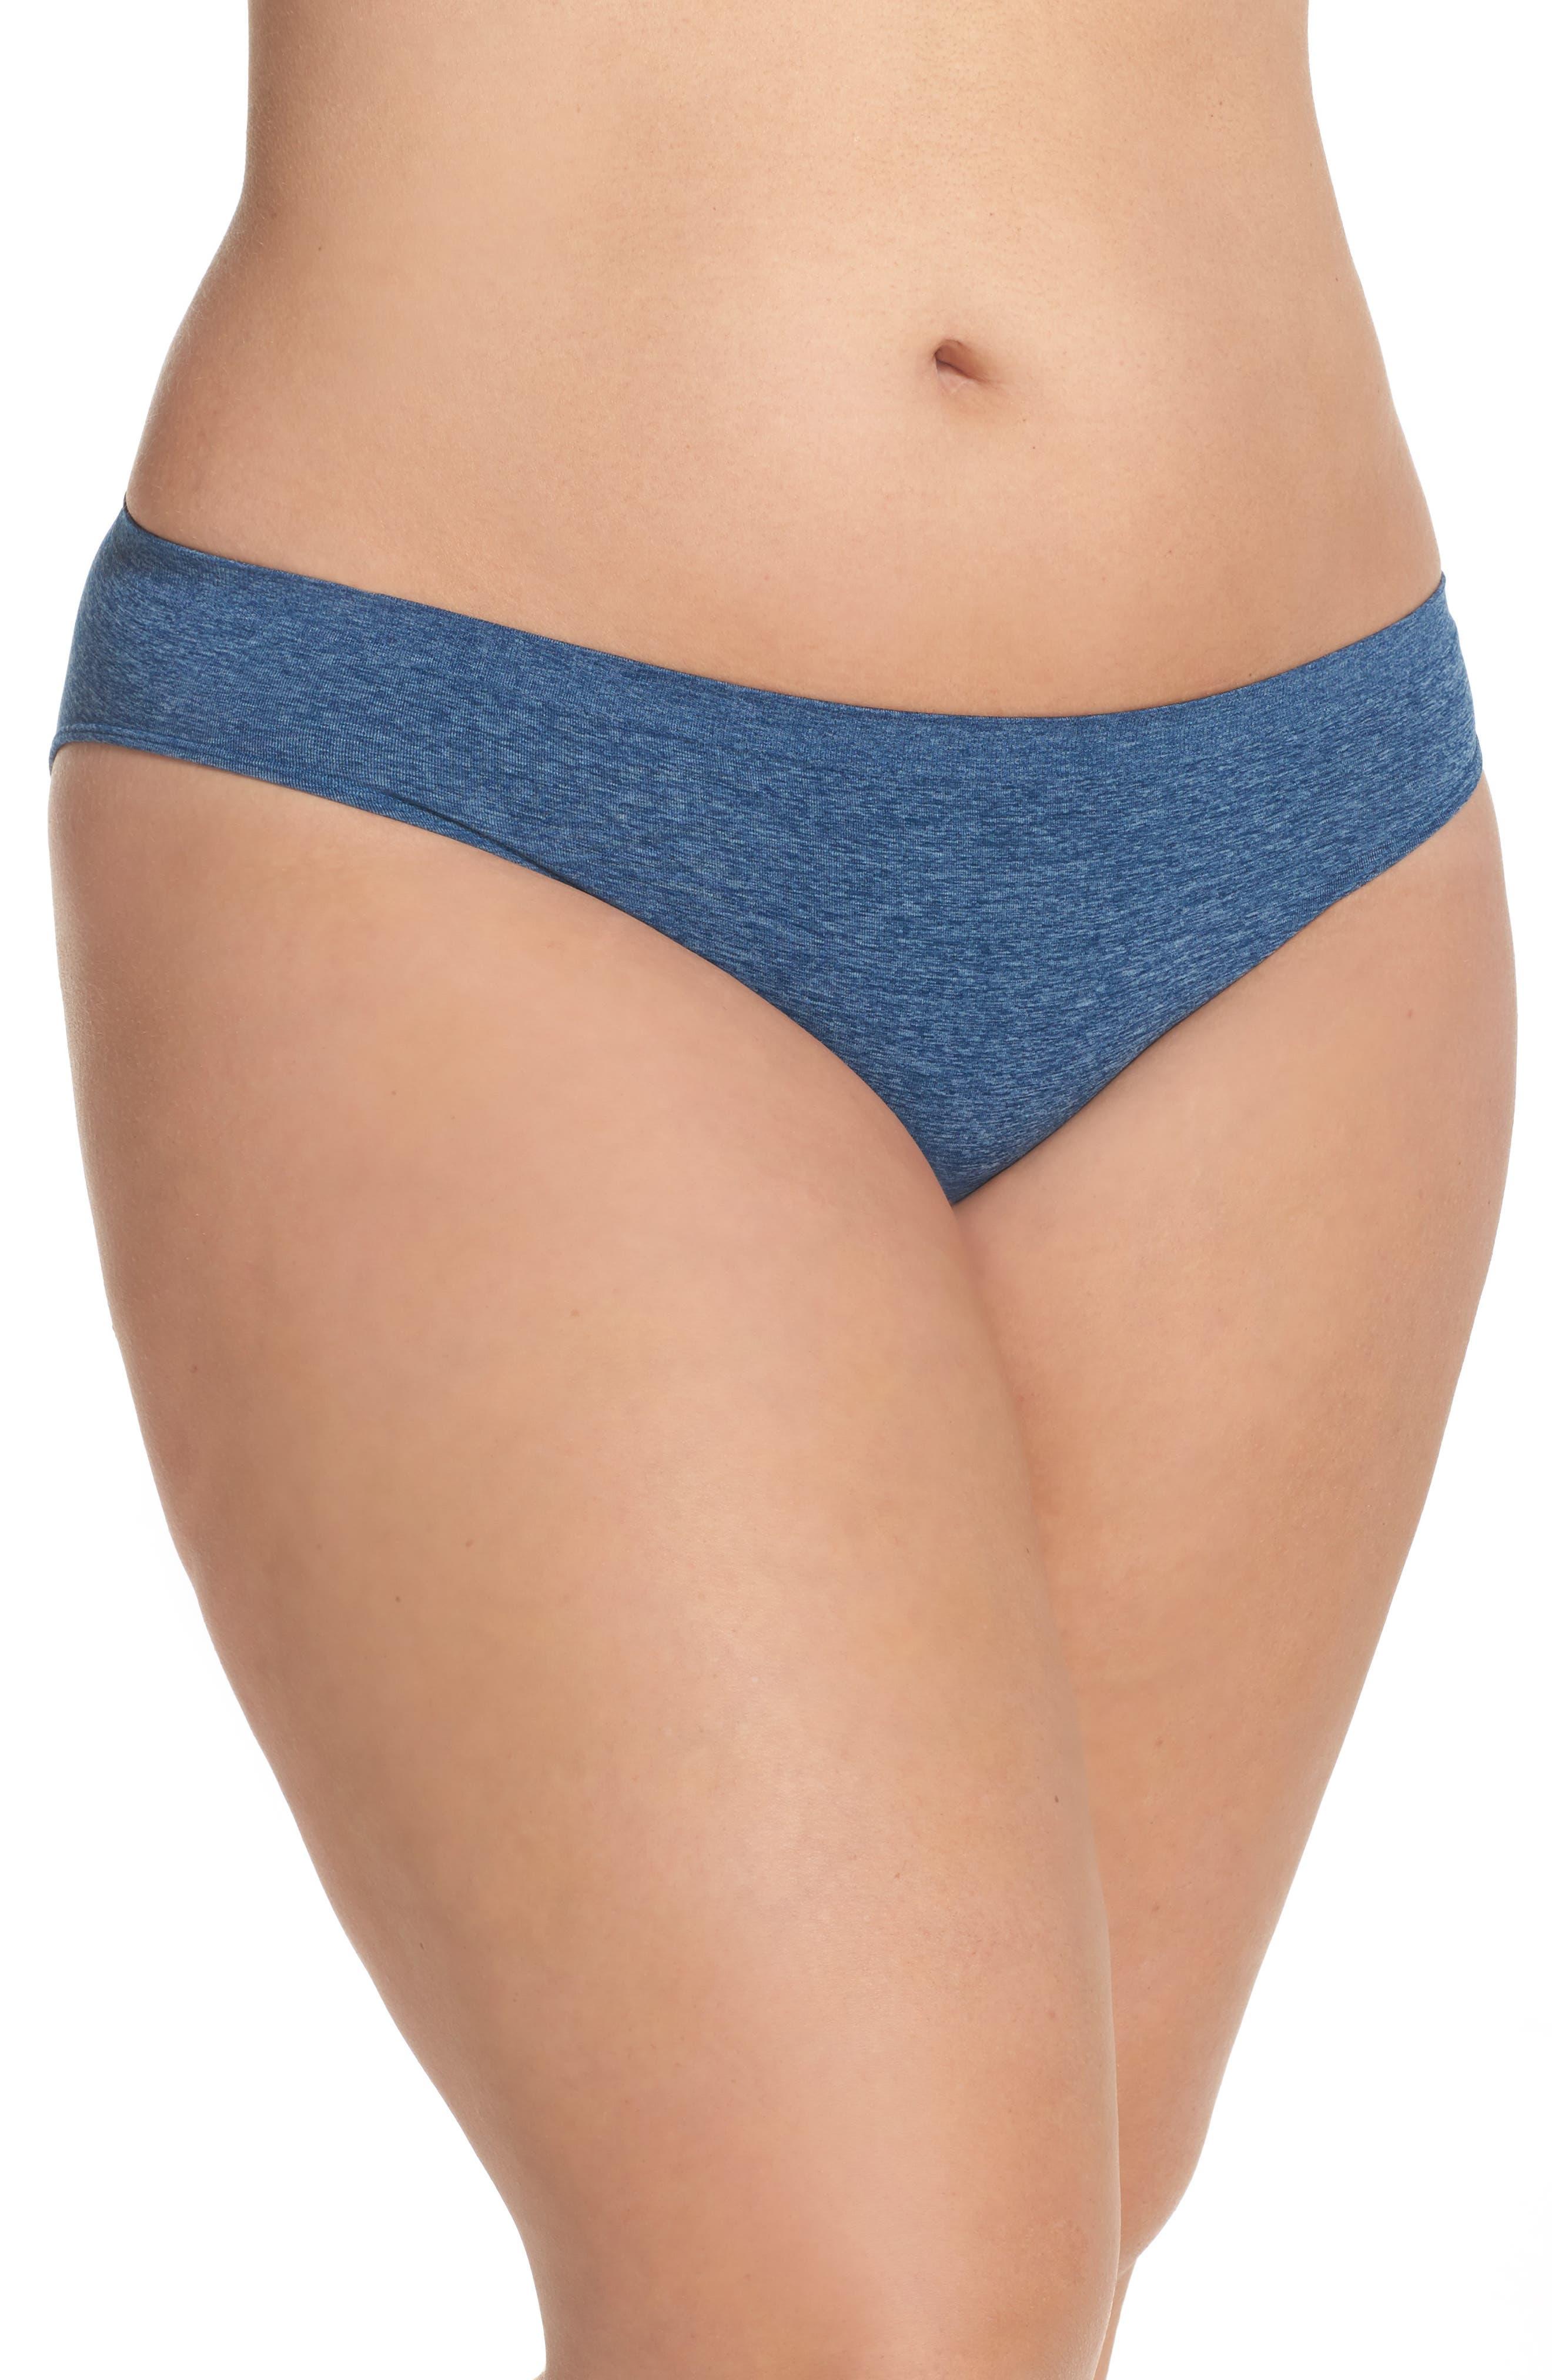 Alternate Image 1 Selected - Halogen® Seamless Bikini (Plus Size) (3 for $33)